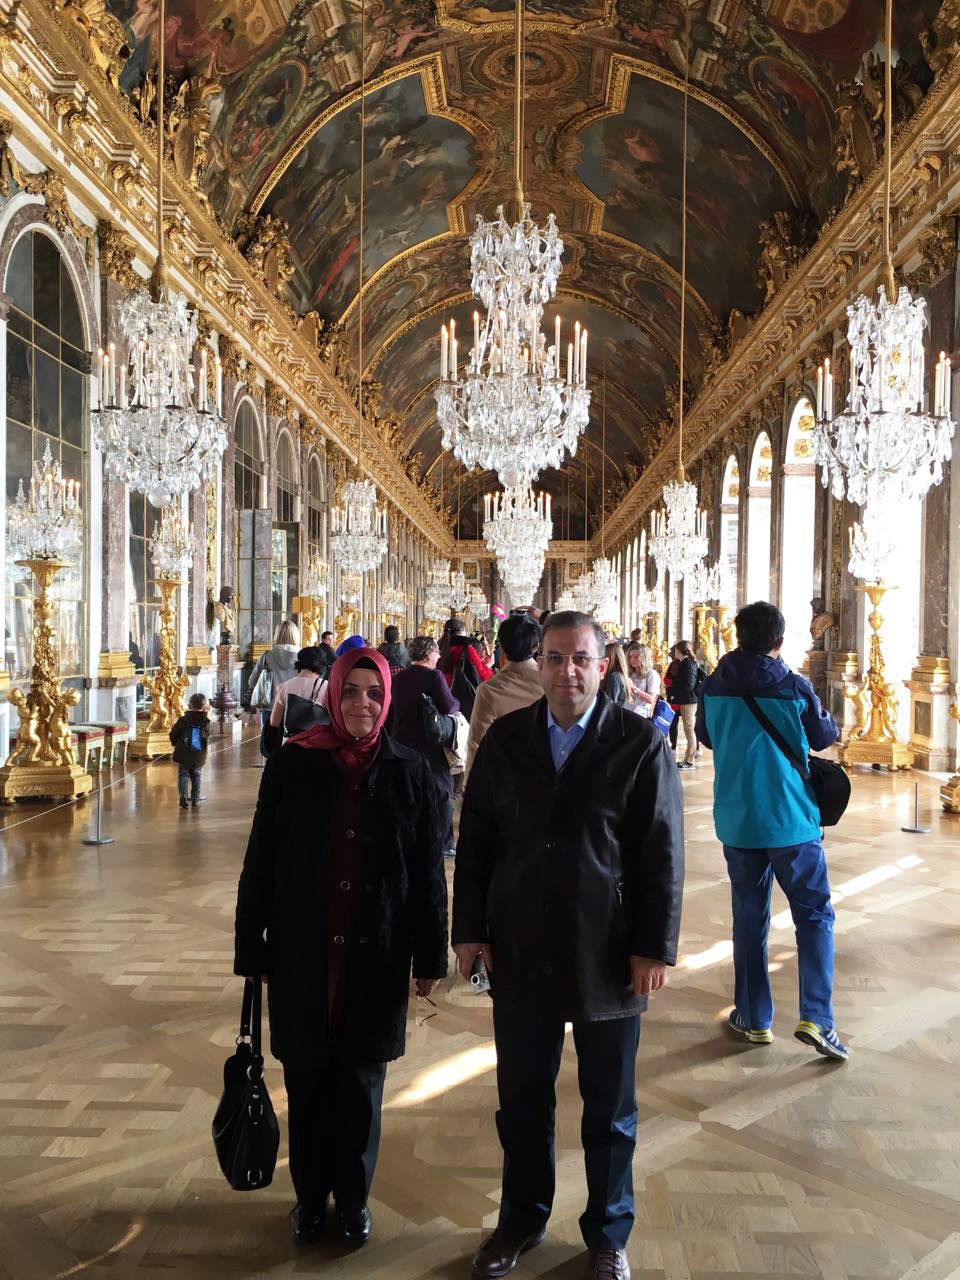 Versay Sarayı'nın ihtişamlı salonlarından biri